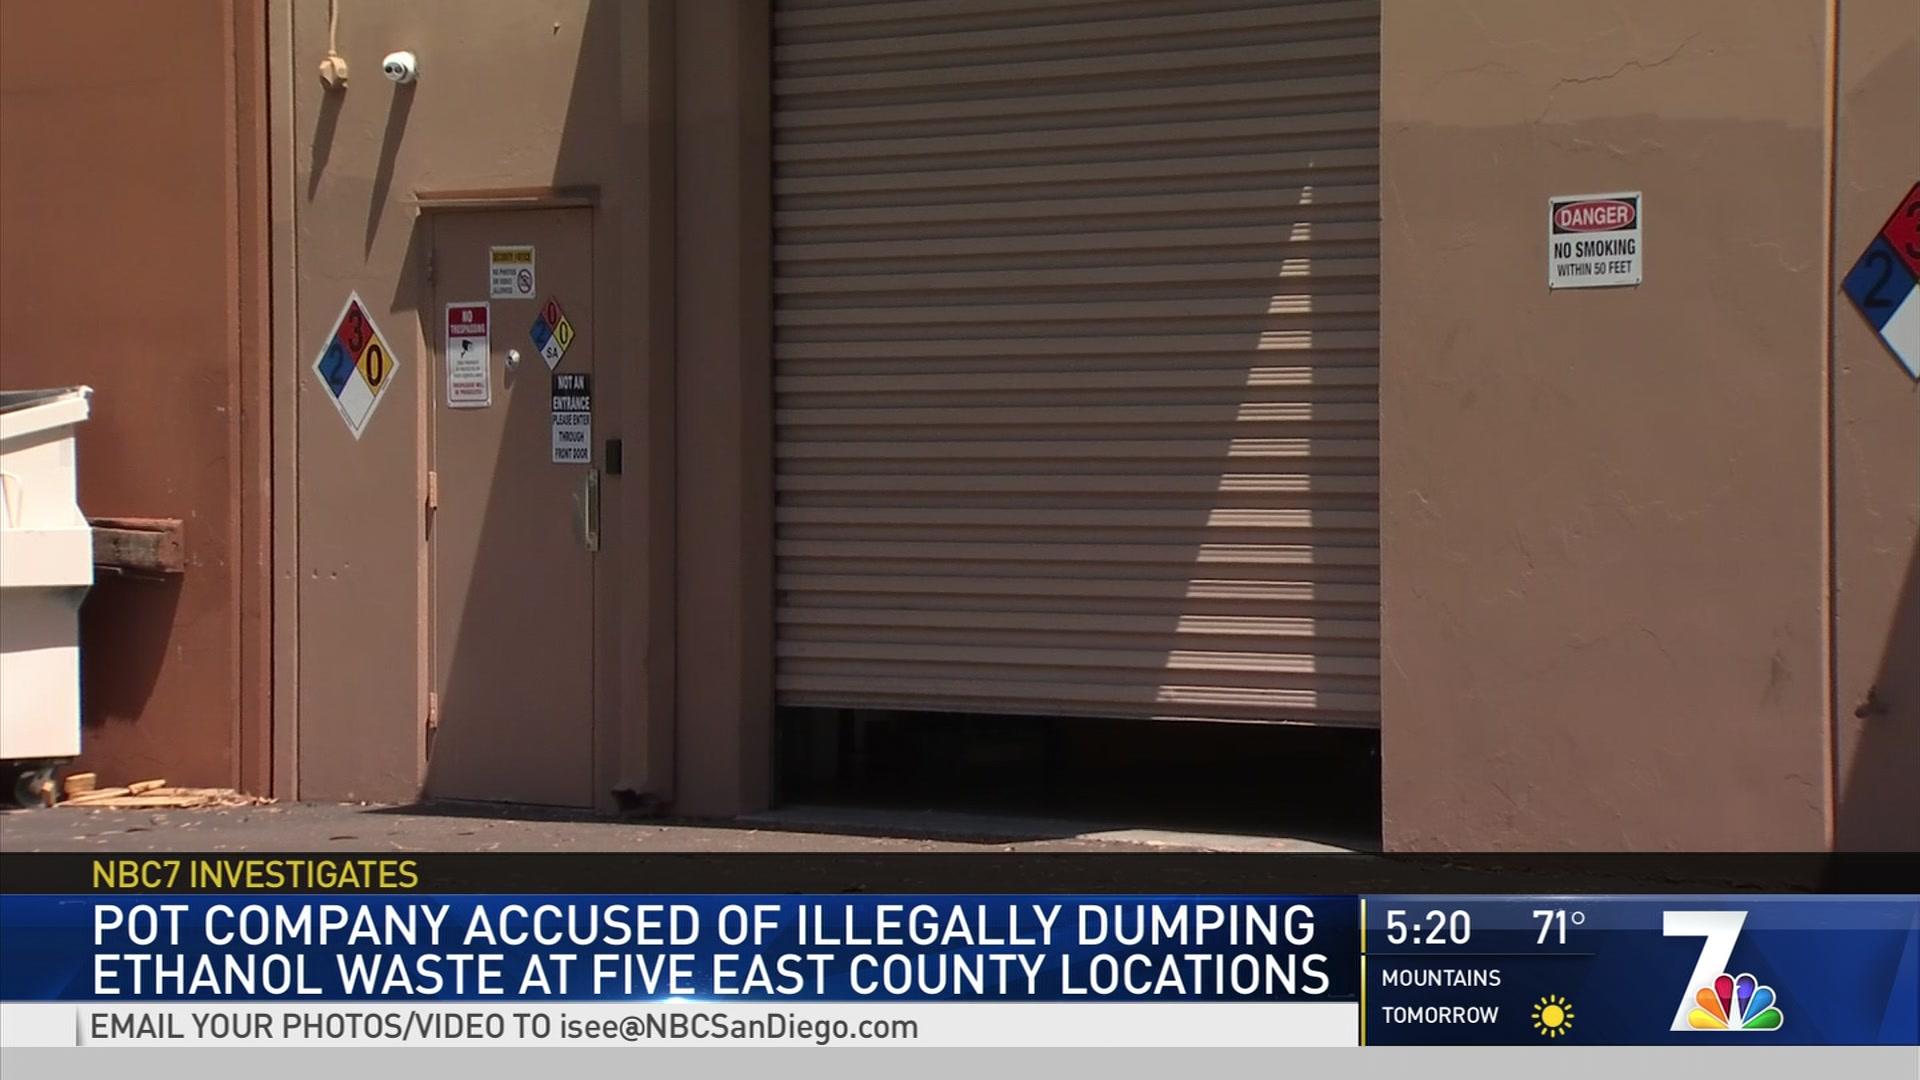 Marijuana Company Accused of Illegally Dumping Hazardous Waste